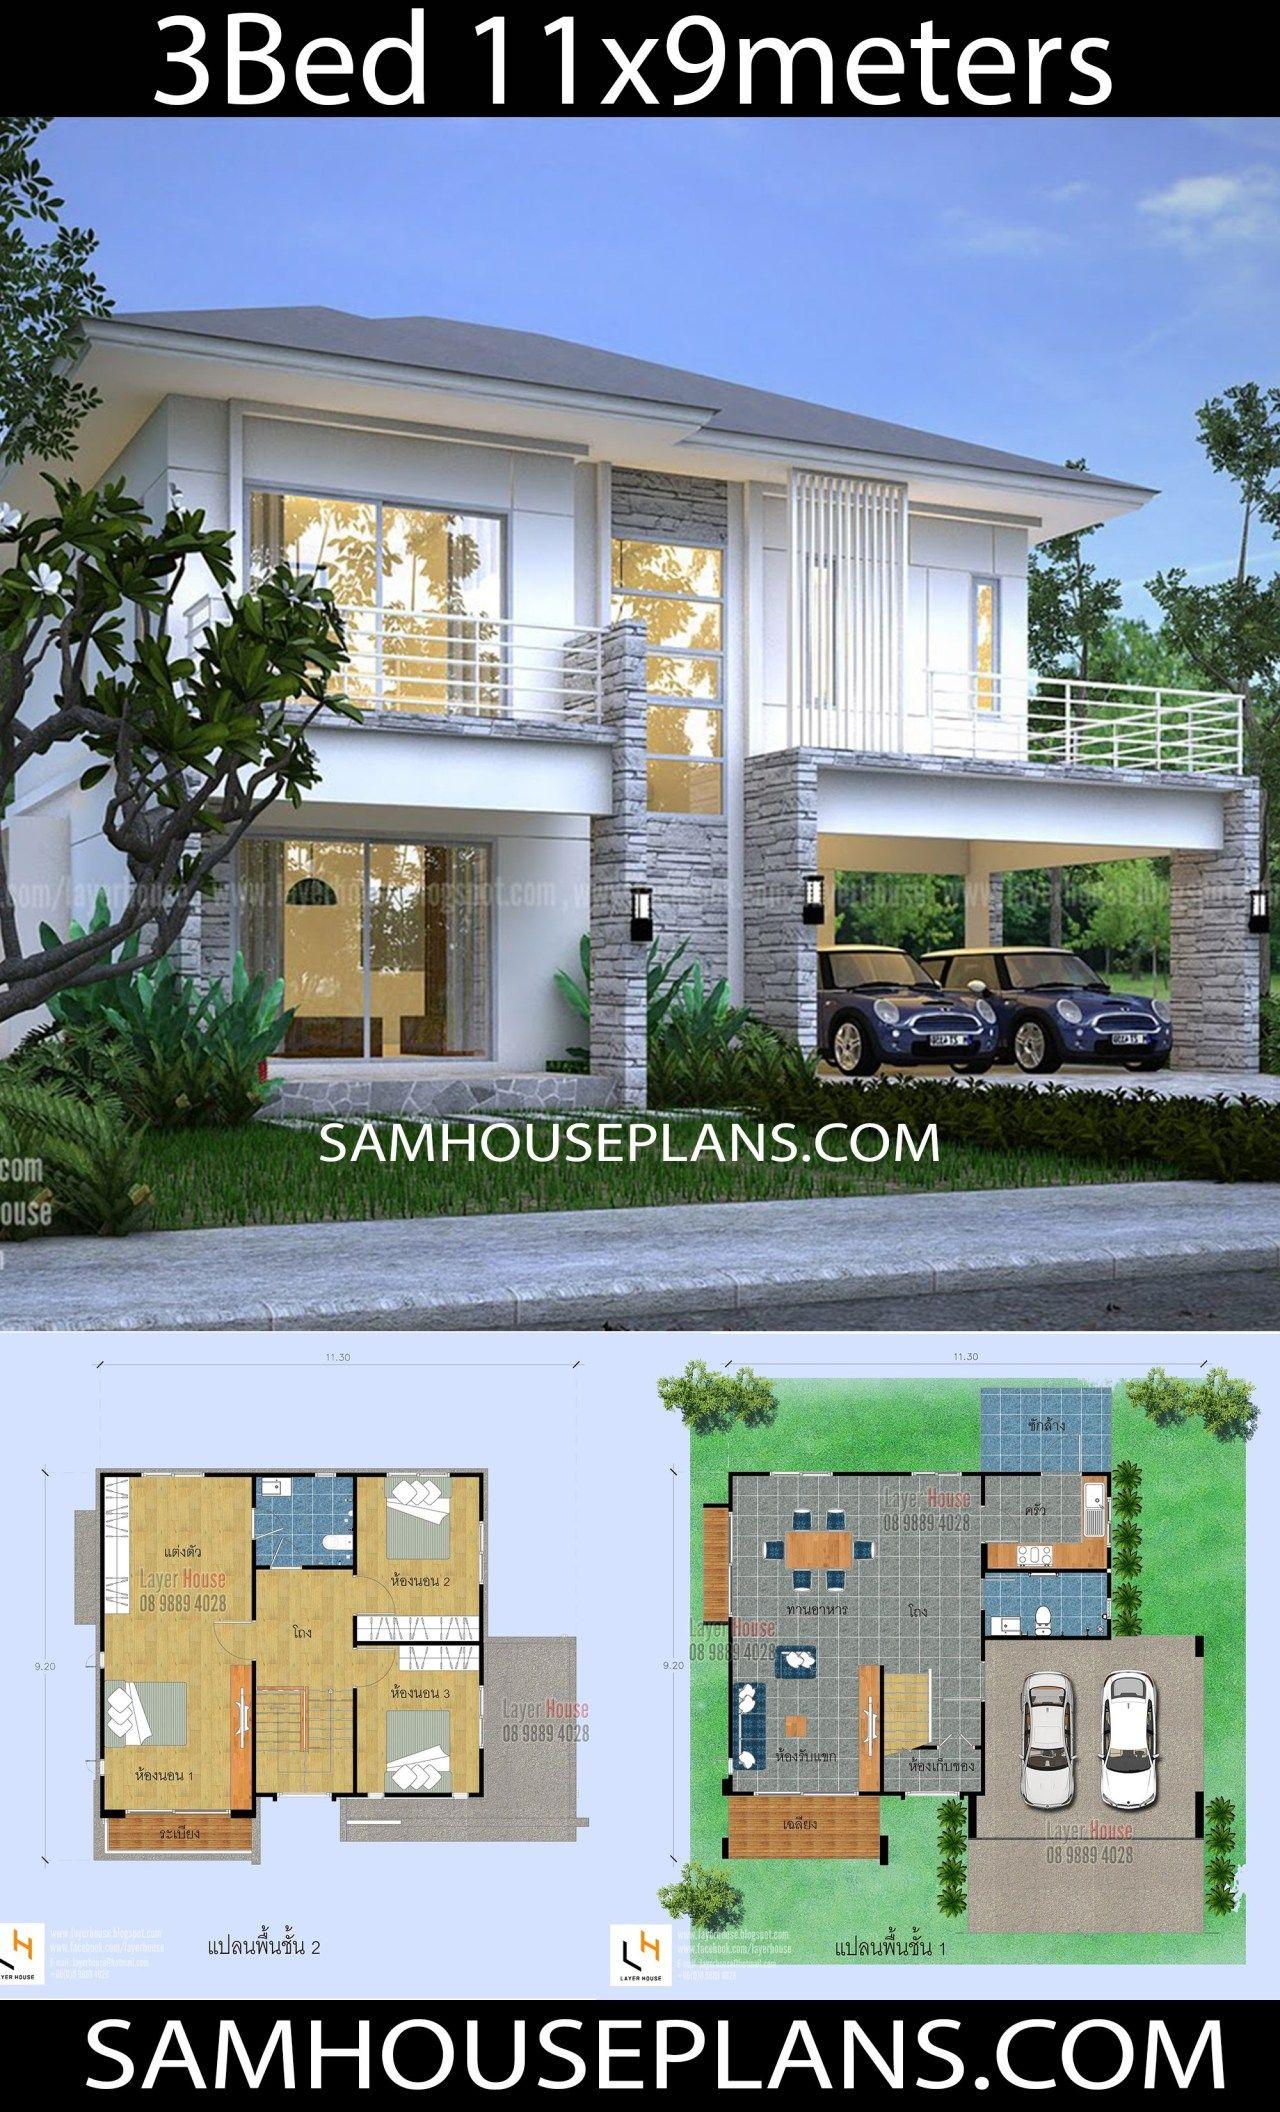 House Plans Idea 11x9m With 3 Bedrooms Sam House Plans Model House Plan Architectural House Plans House Plans